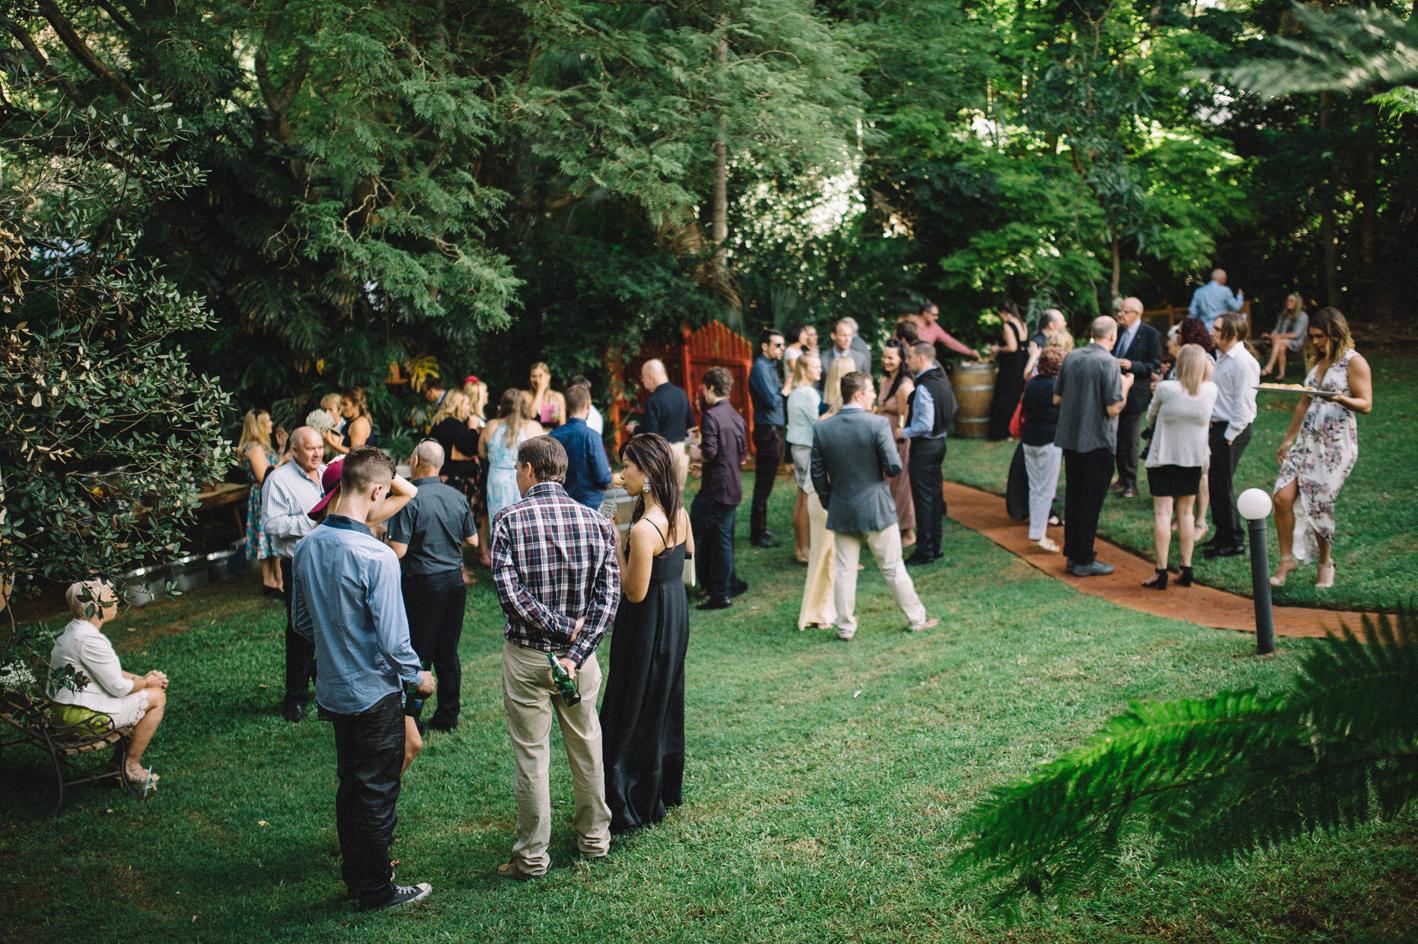 072-michelle-reagan-mount-tamborine-wedding-sophie-baker-photography